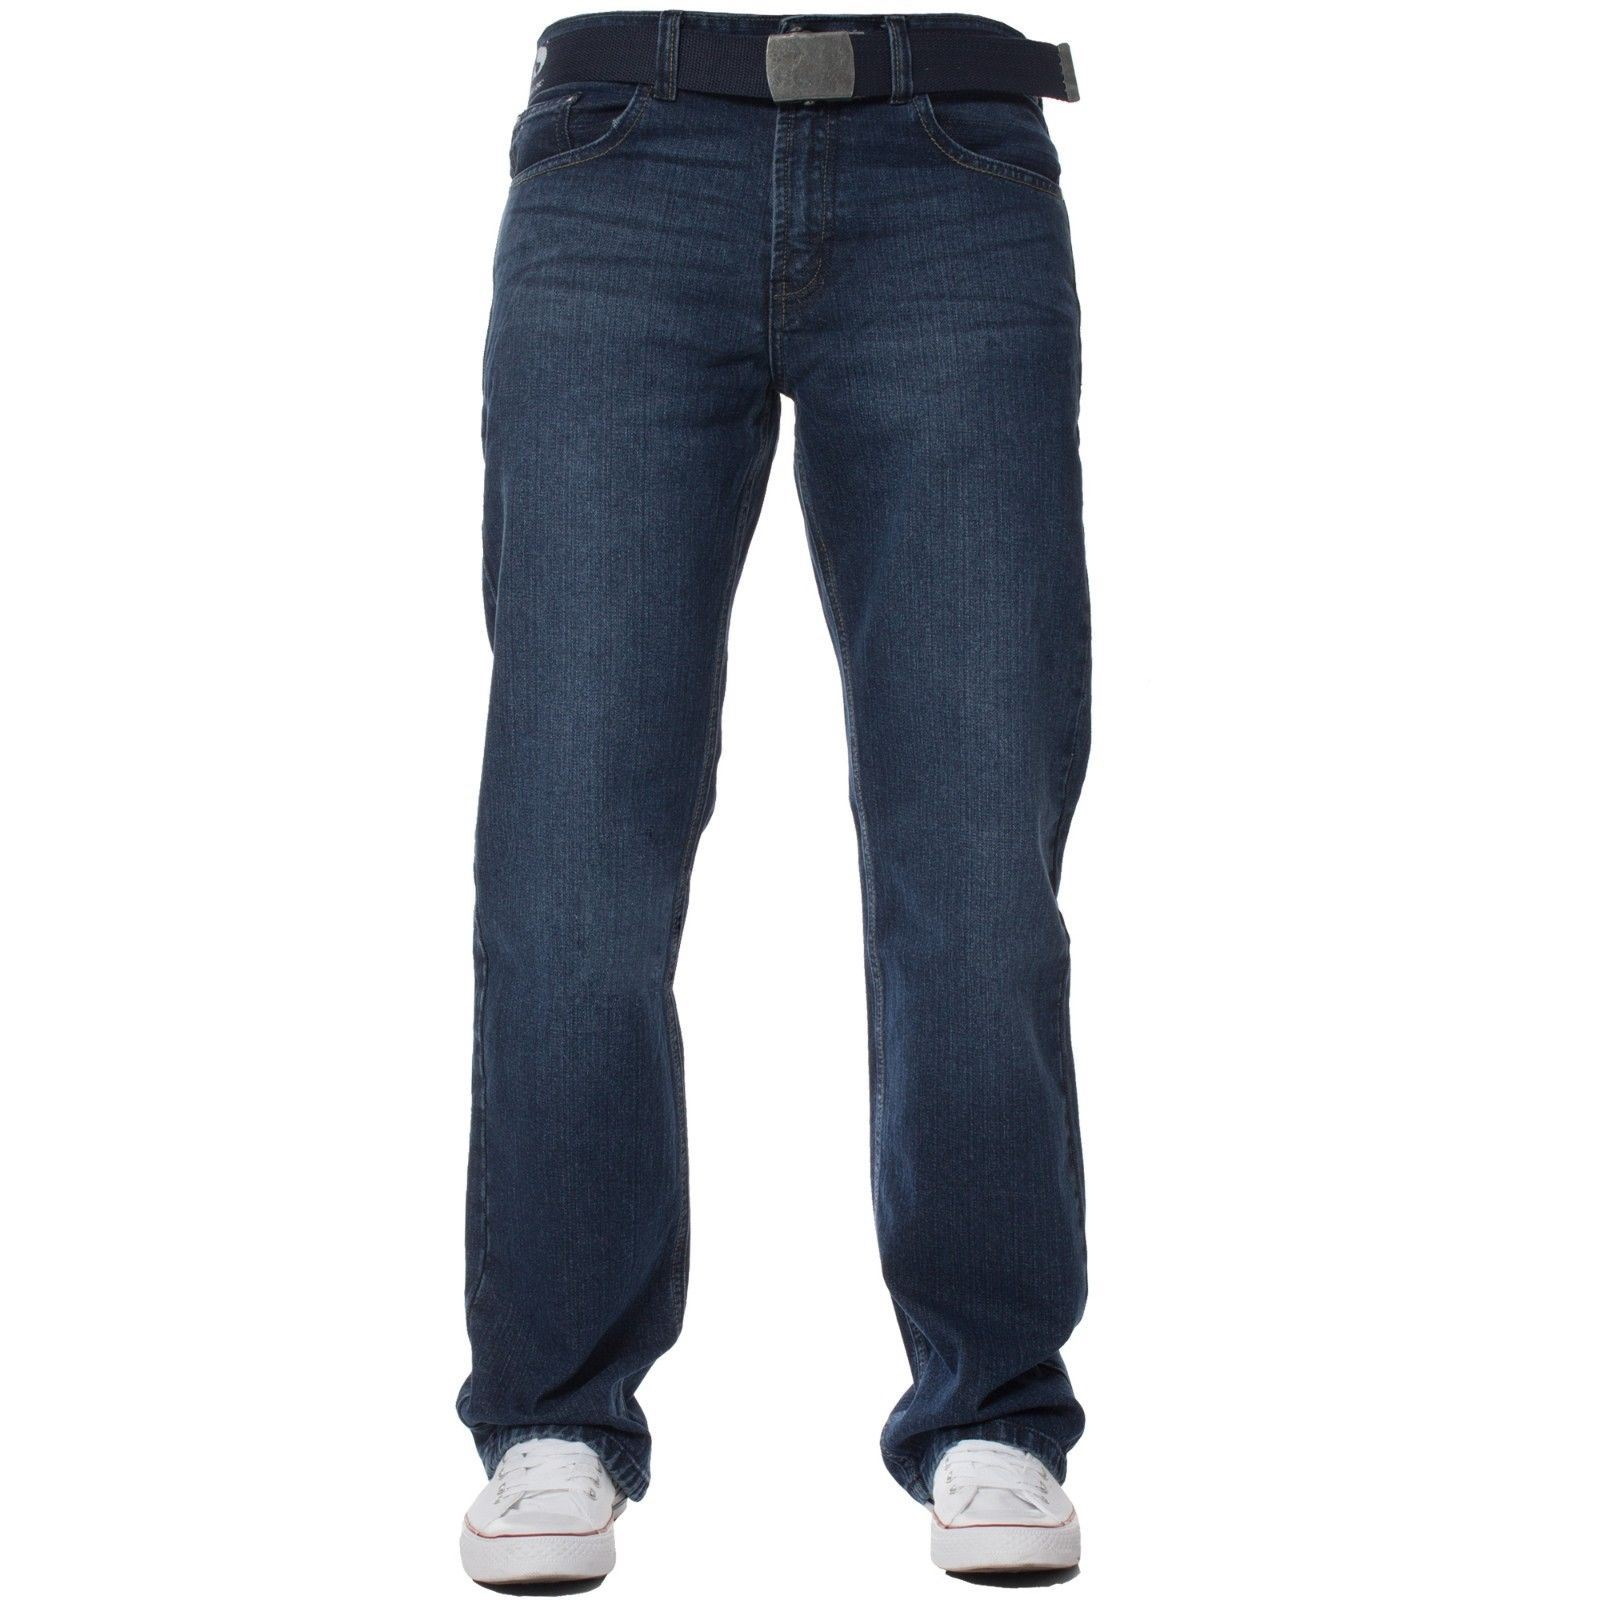 Mens-Straight-Leg-Jeans-Regular-Fit-Denim-Pants-Cotton-Free-Belt-All-Waist-Sizes thumbnail 4